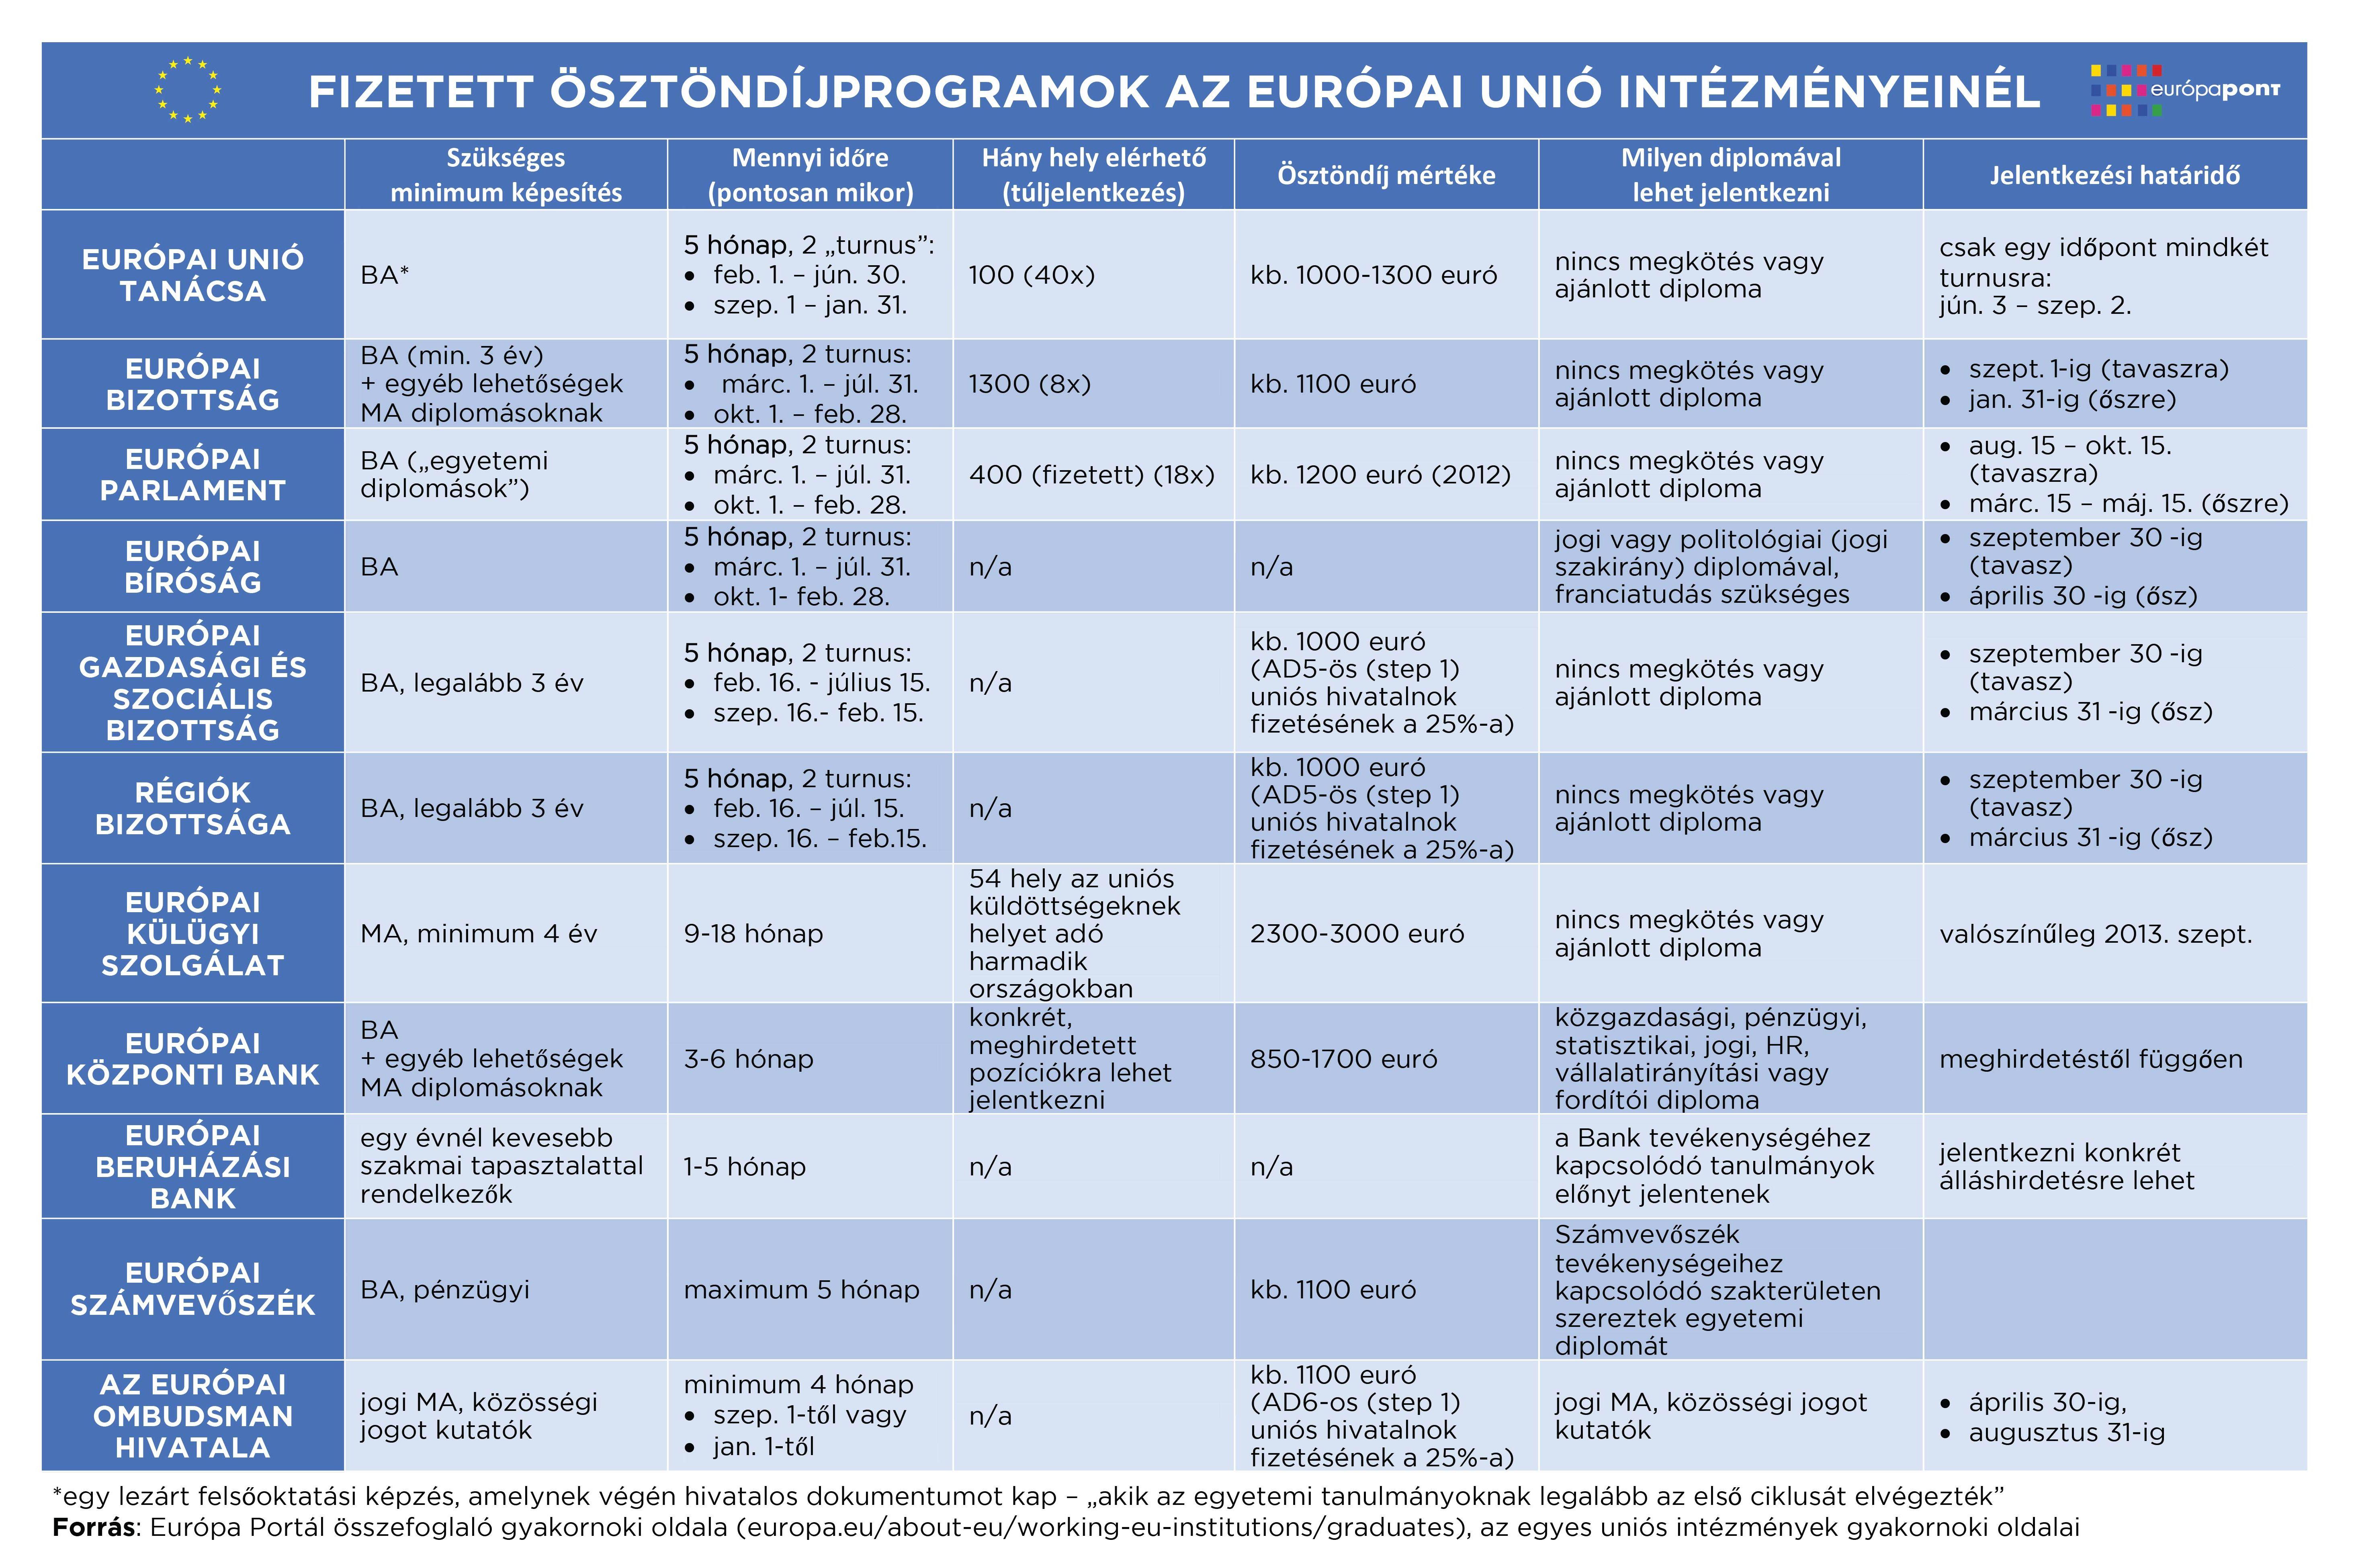 EU-s_osztondijak.jpg